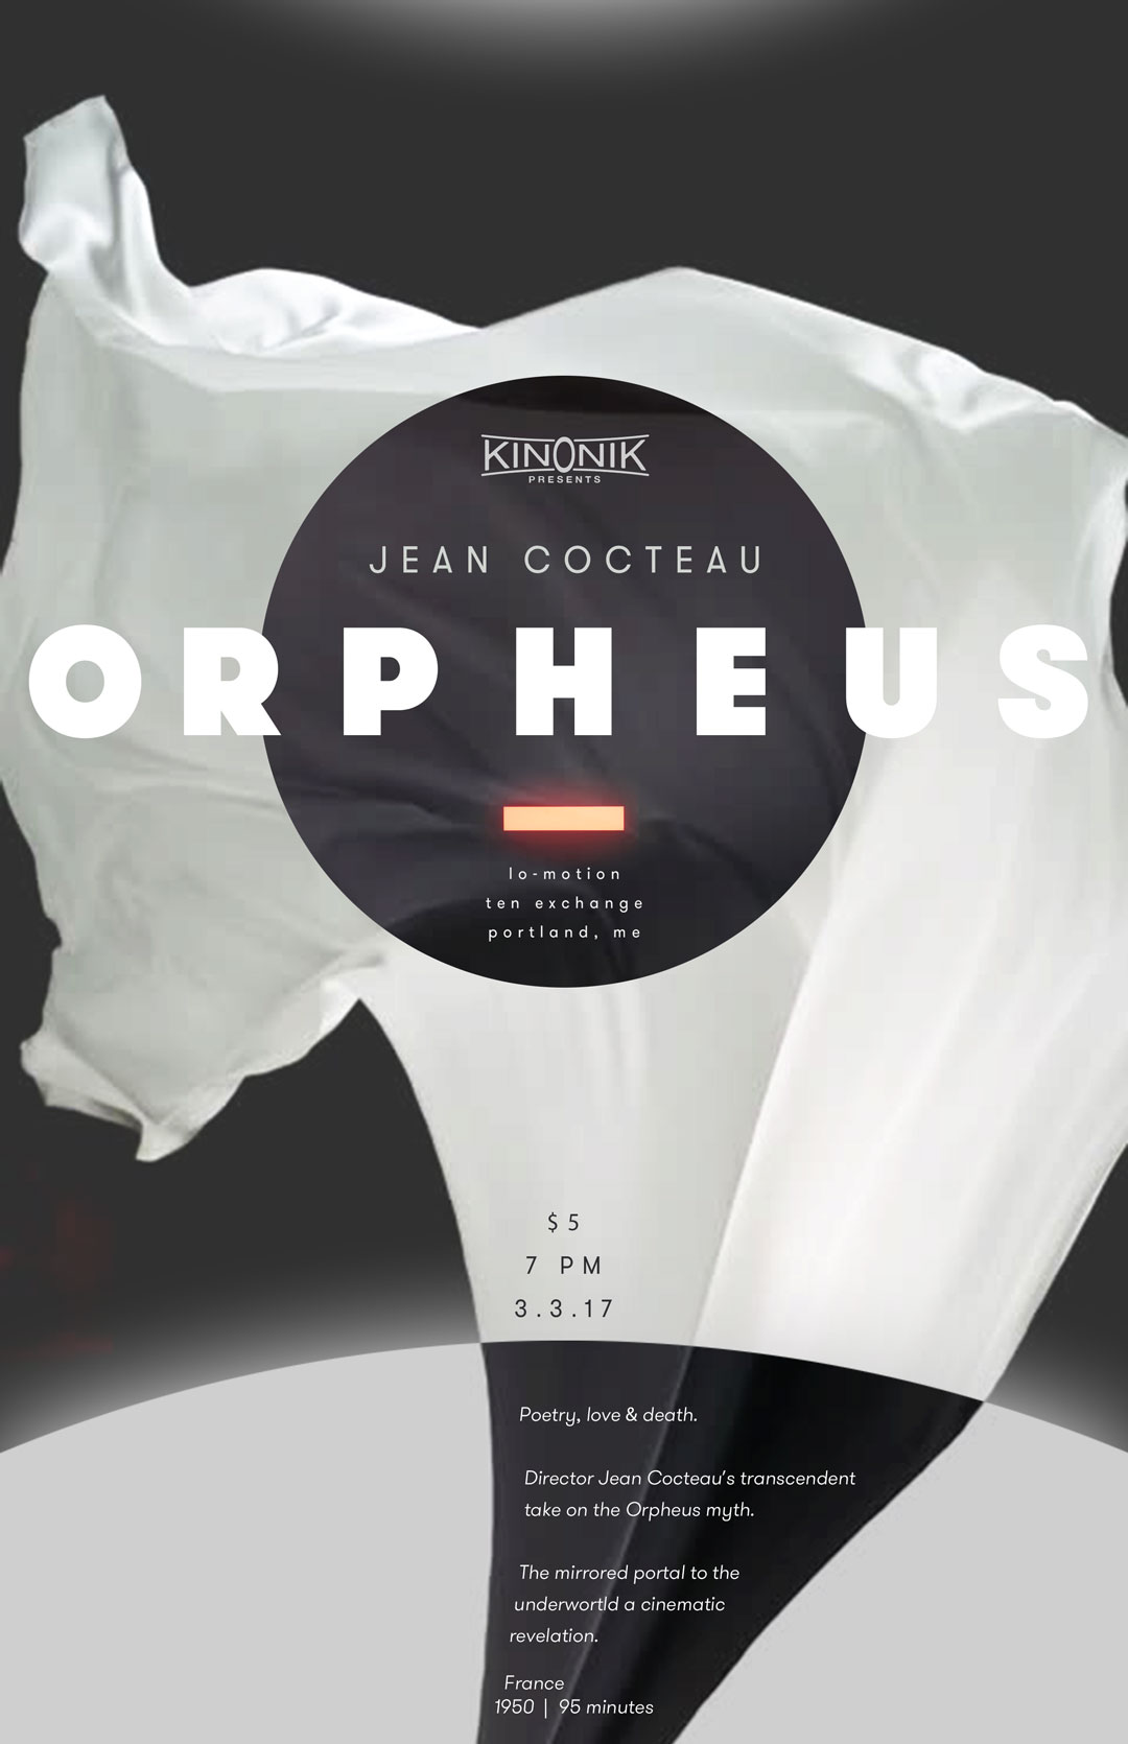 Poster for Jean Cocteau's Orpheus